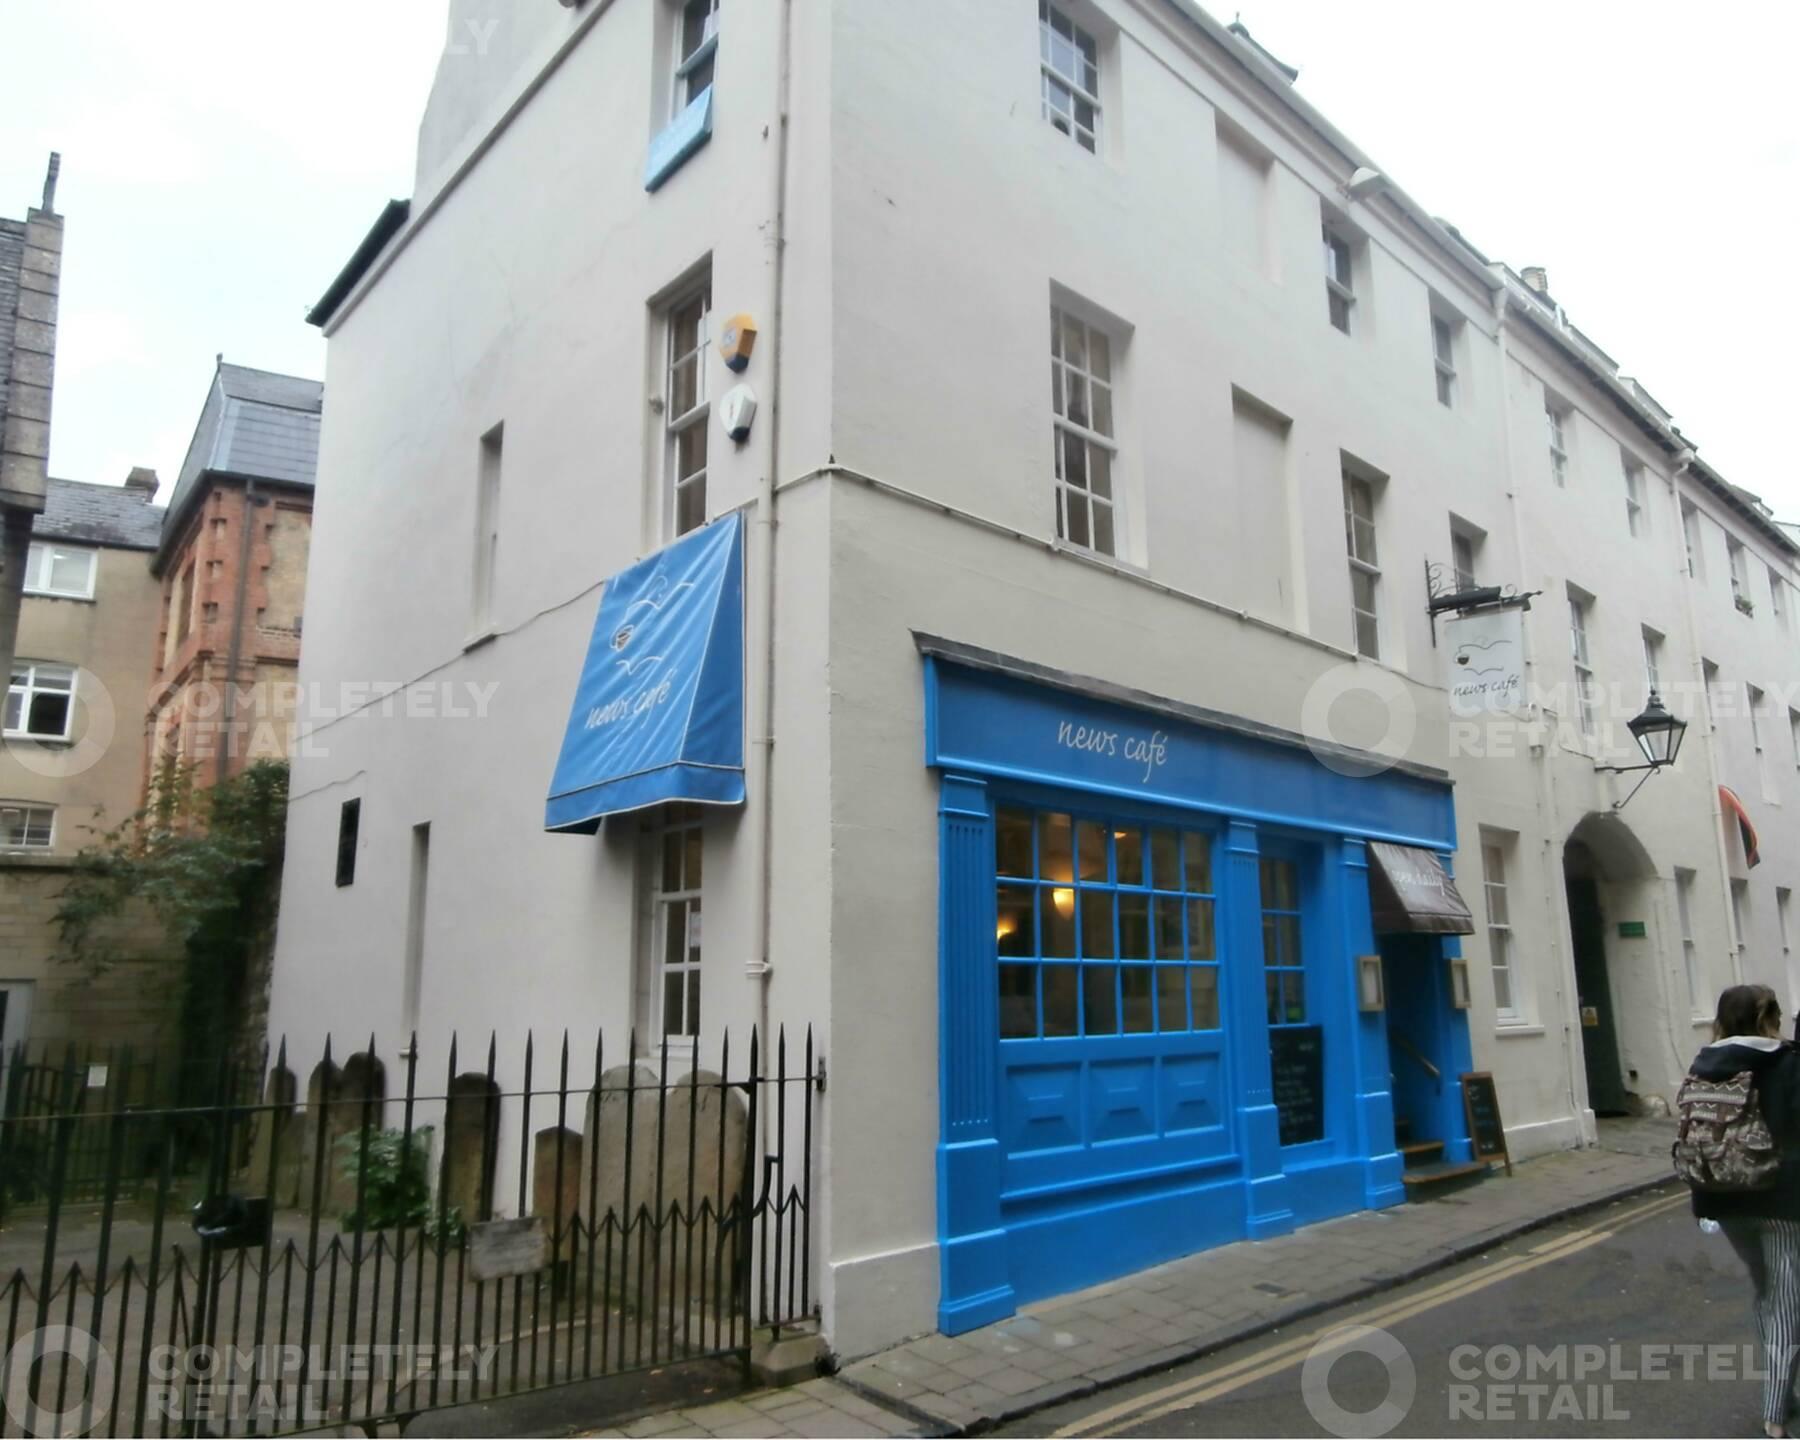 News Cafe, 1 - 2 Ship Street